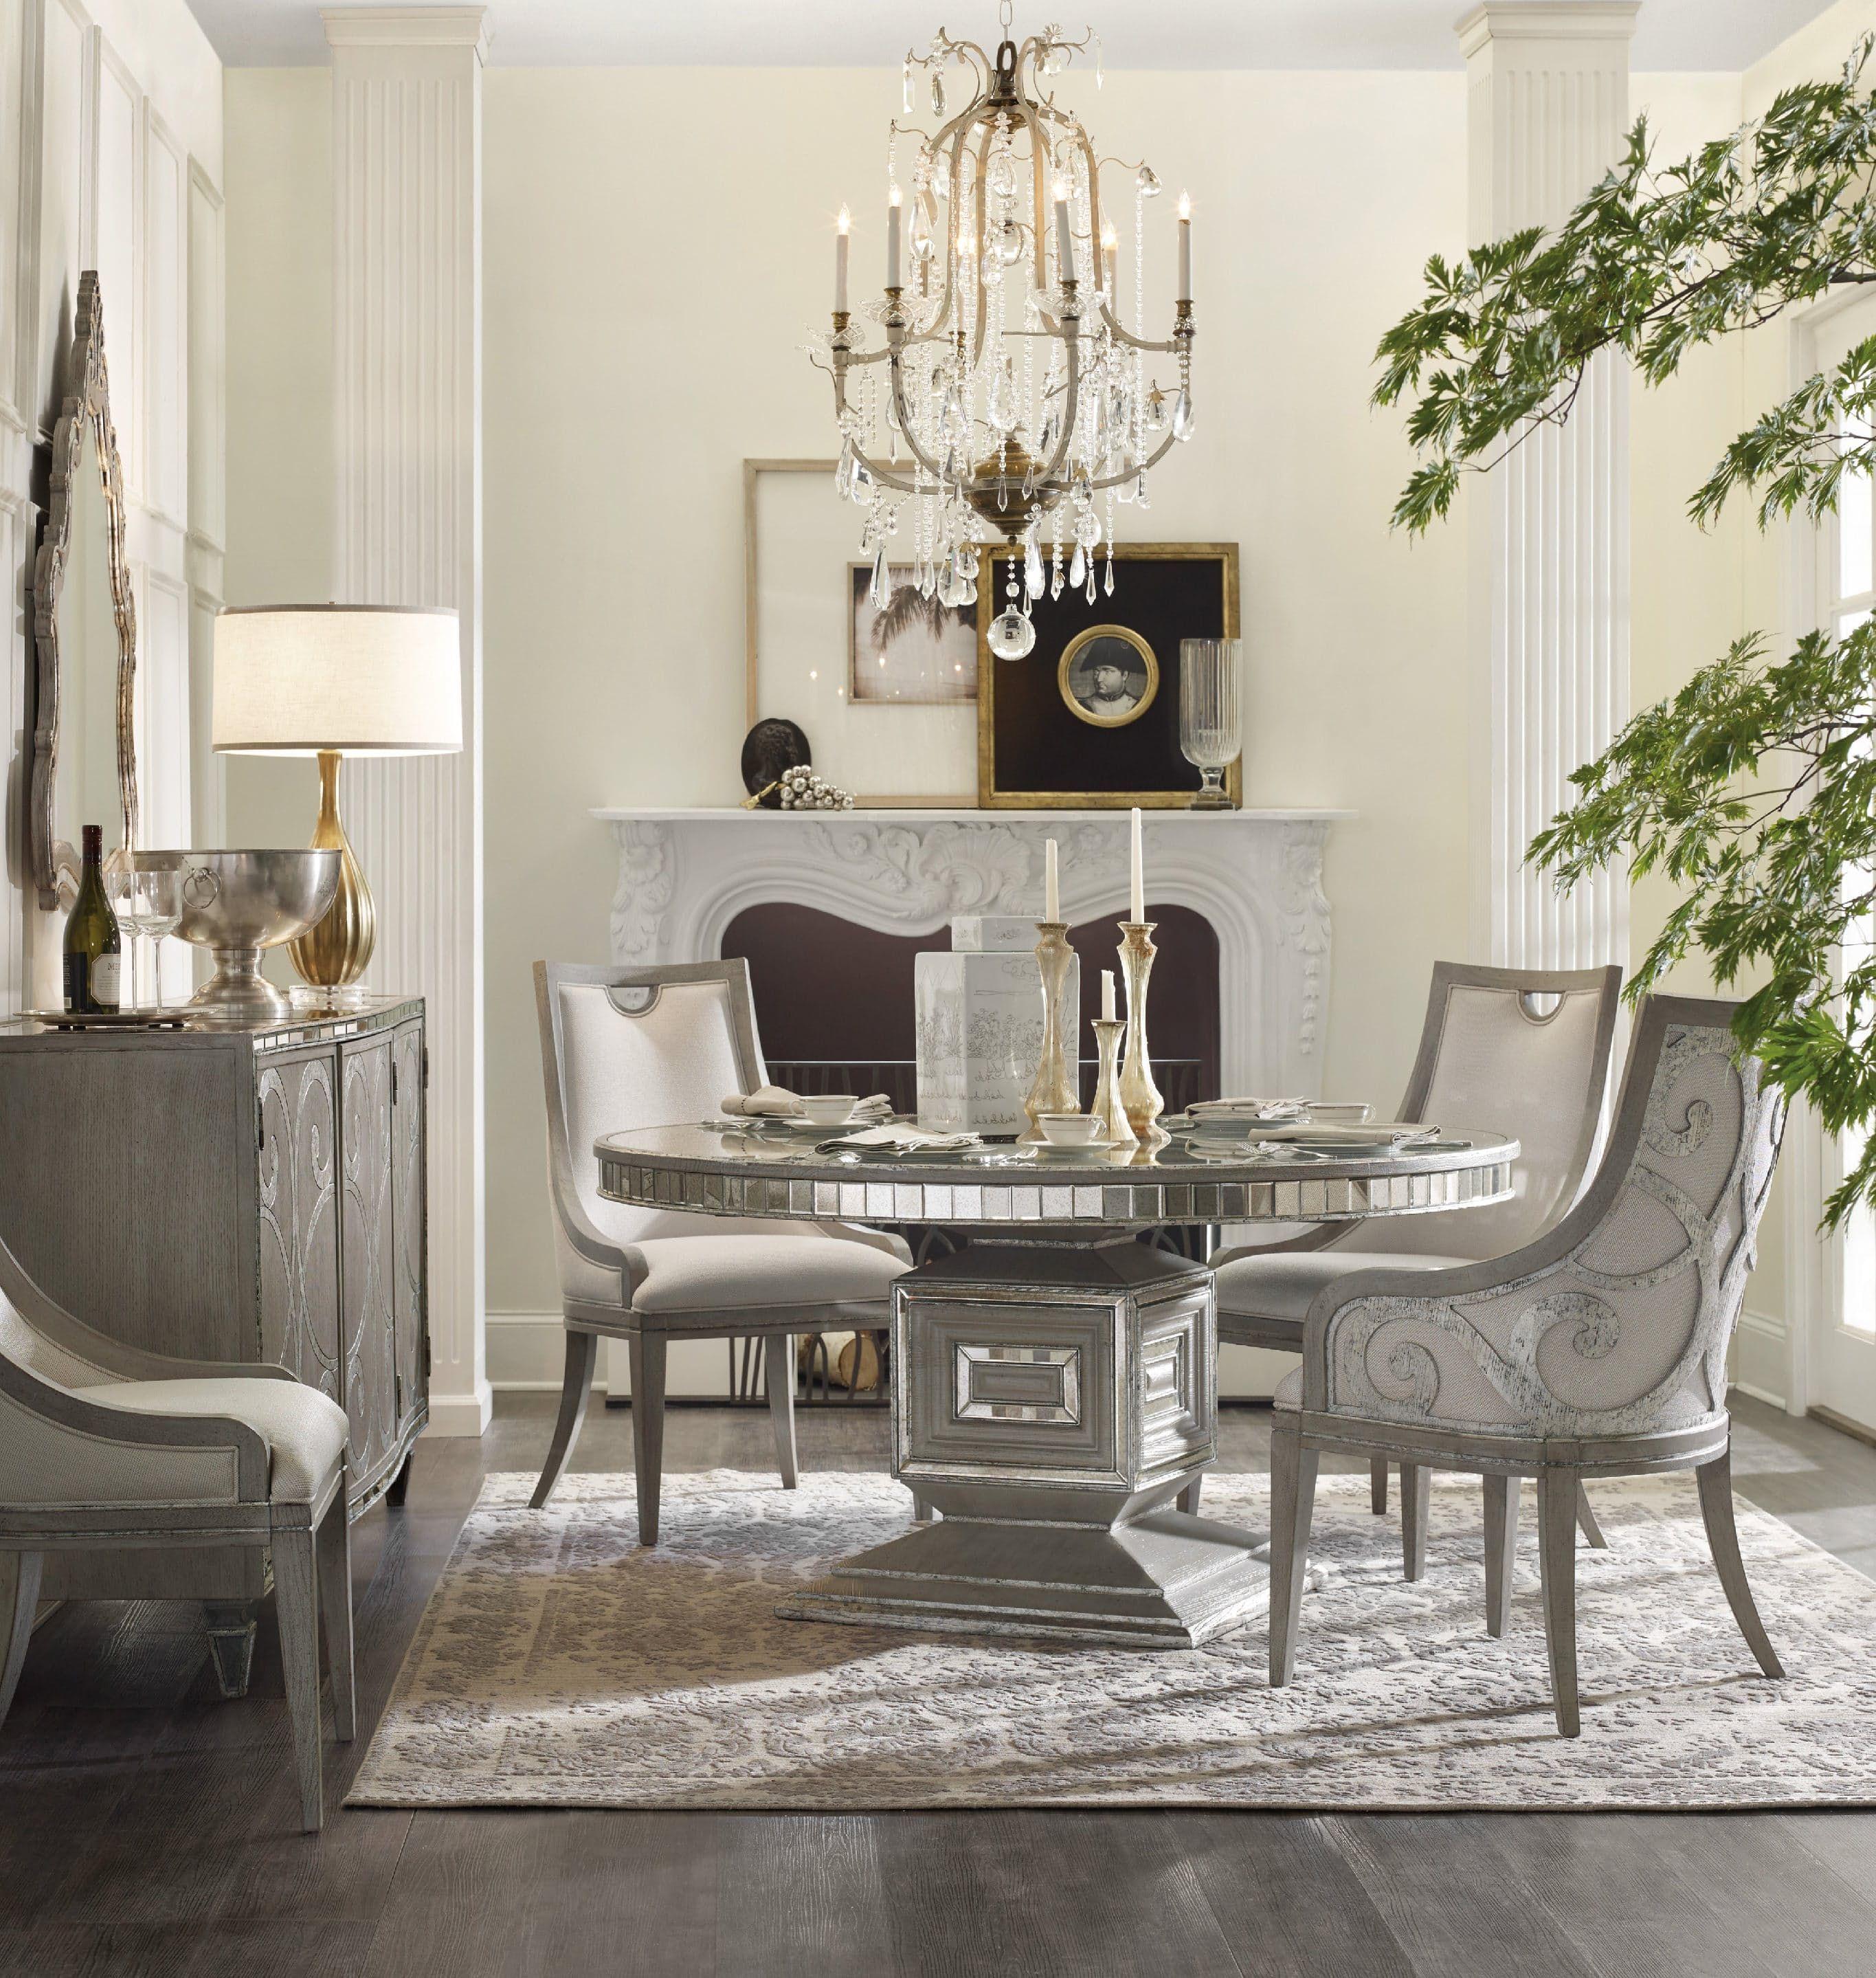 Furniture Dining Room Sanctuary Round Table 5603 75203 Ltbr Louis Shanks Austin Houston San Antonio Tx